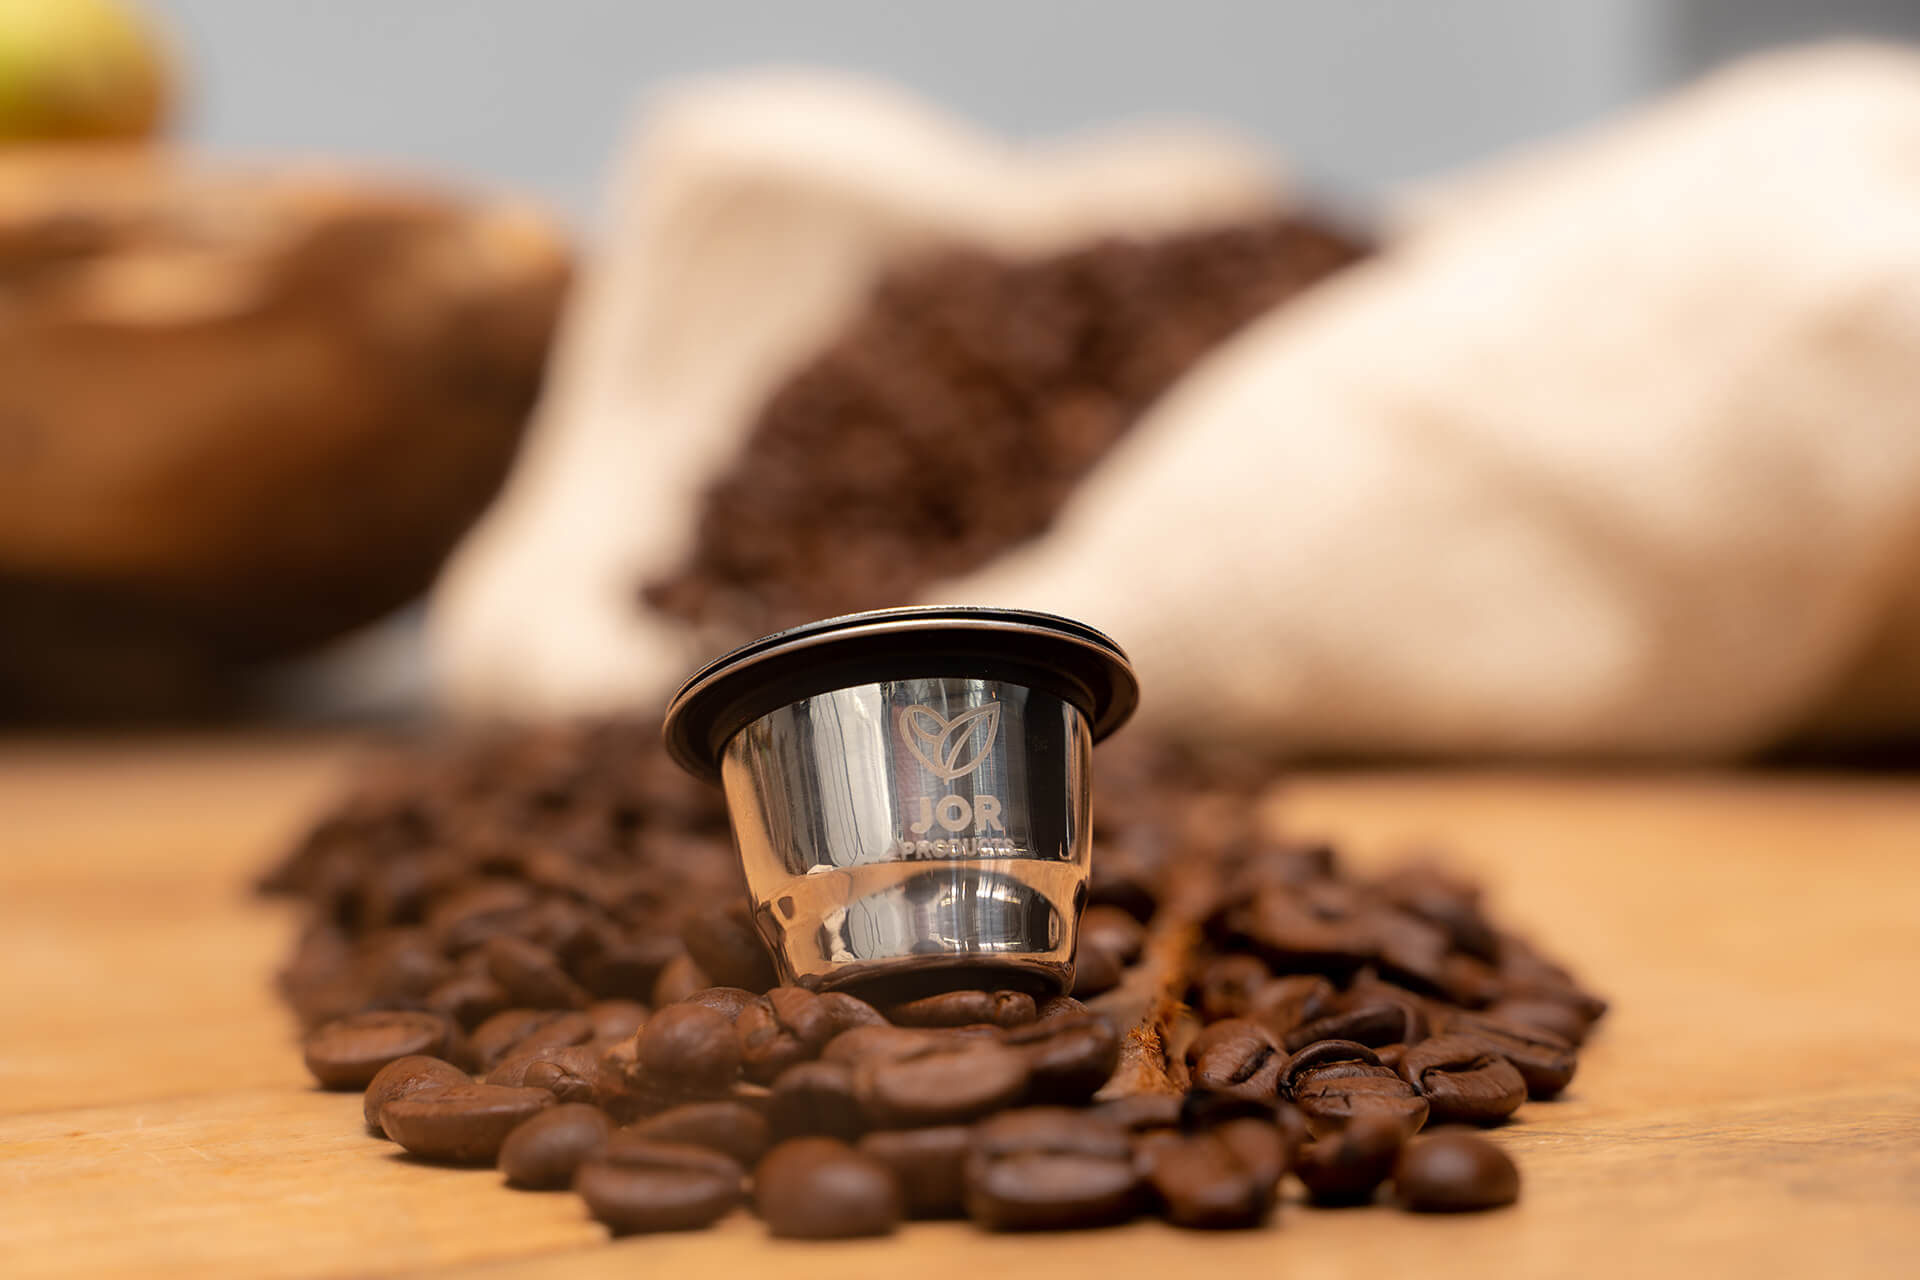 Jor products herbruikbare nespresso cup